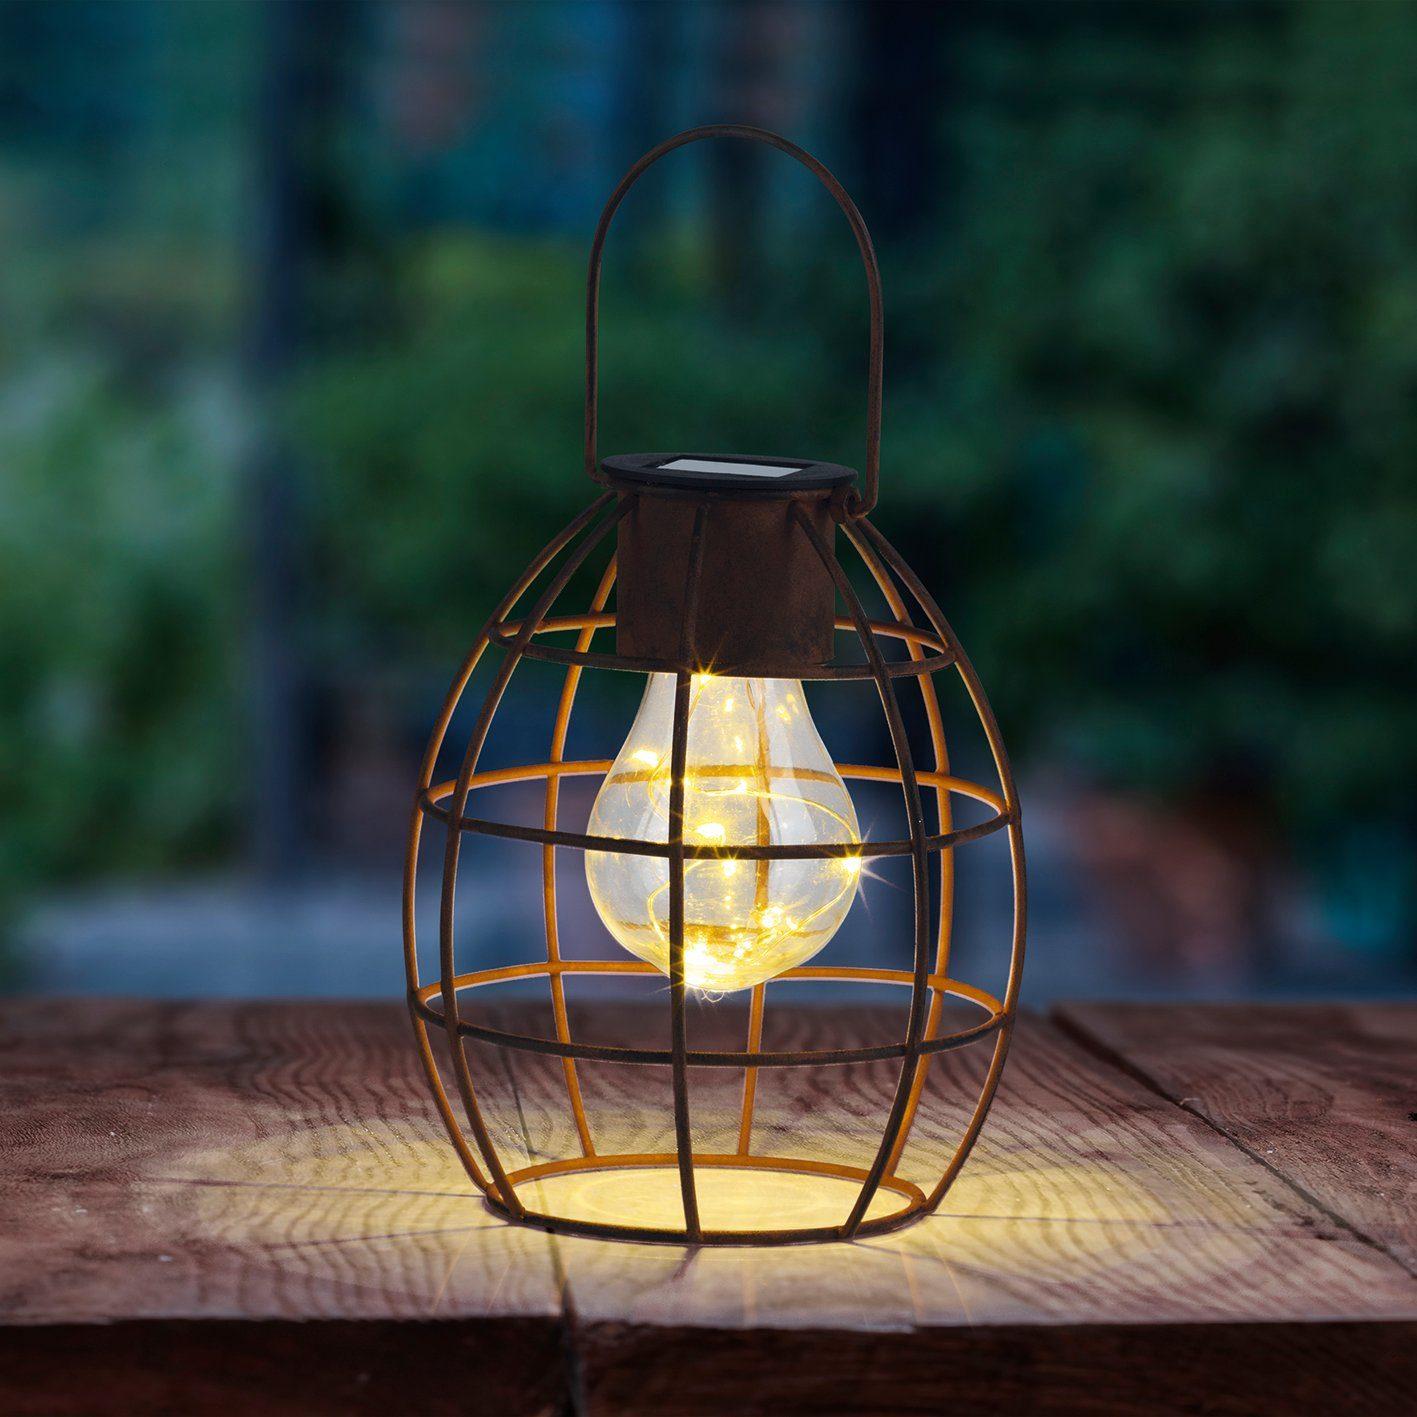 LED Solarlampe Edelstahl Mosaik Optik 37 cm Gartenlampe Solarleuchte neu